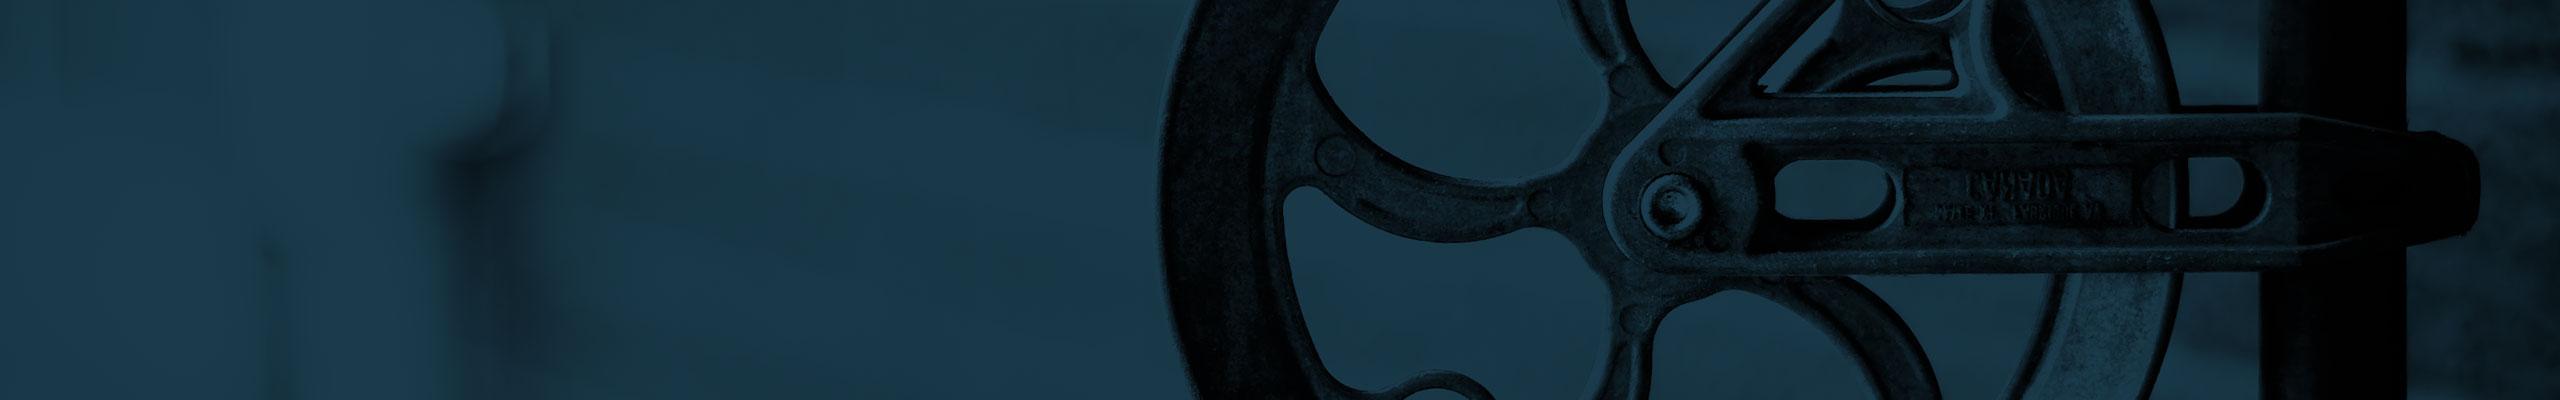 web-tool-2